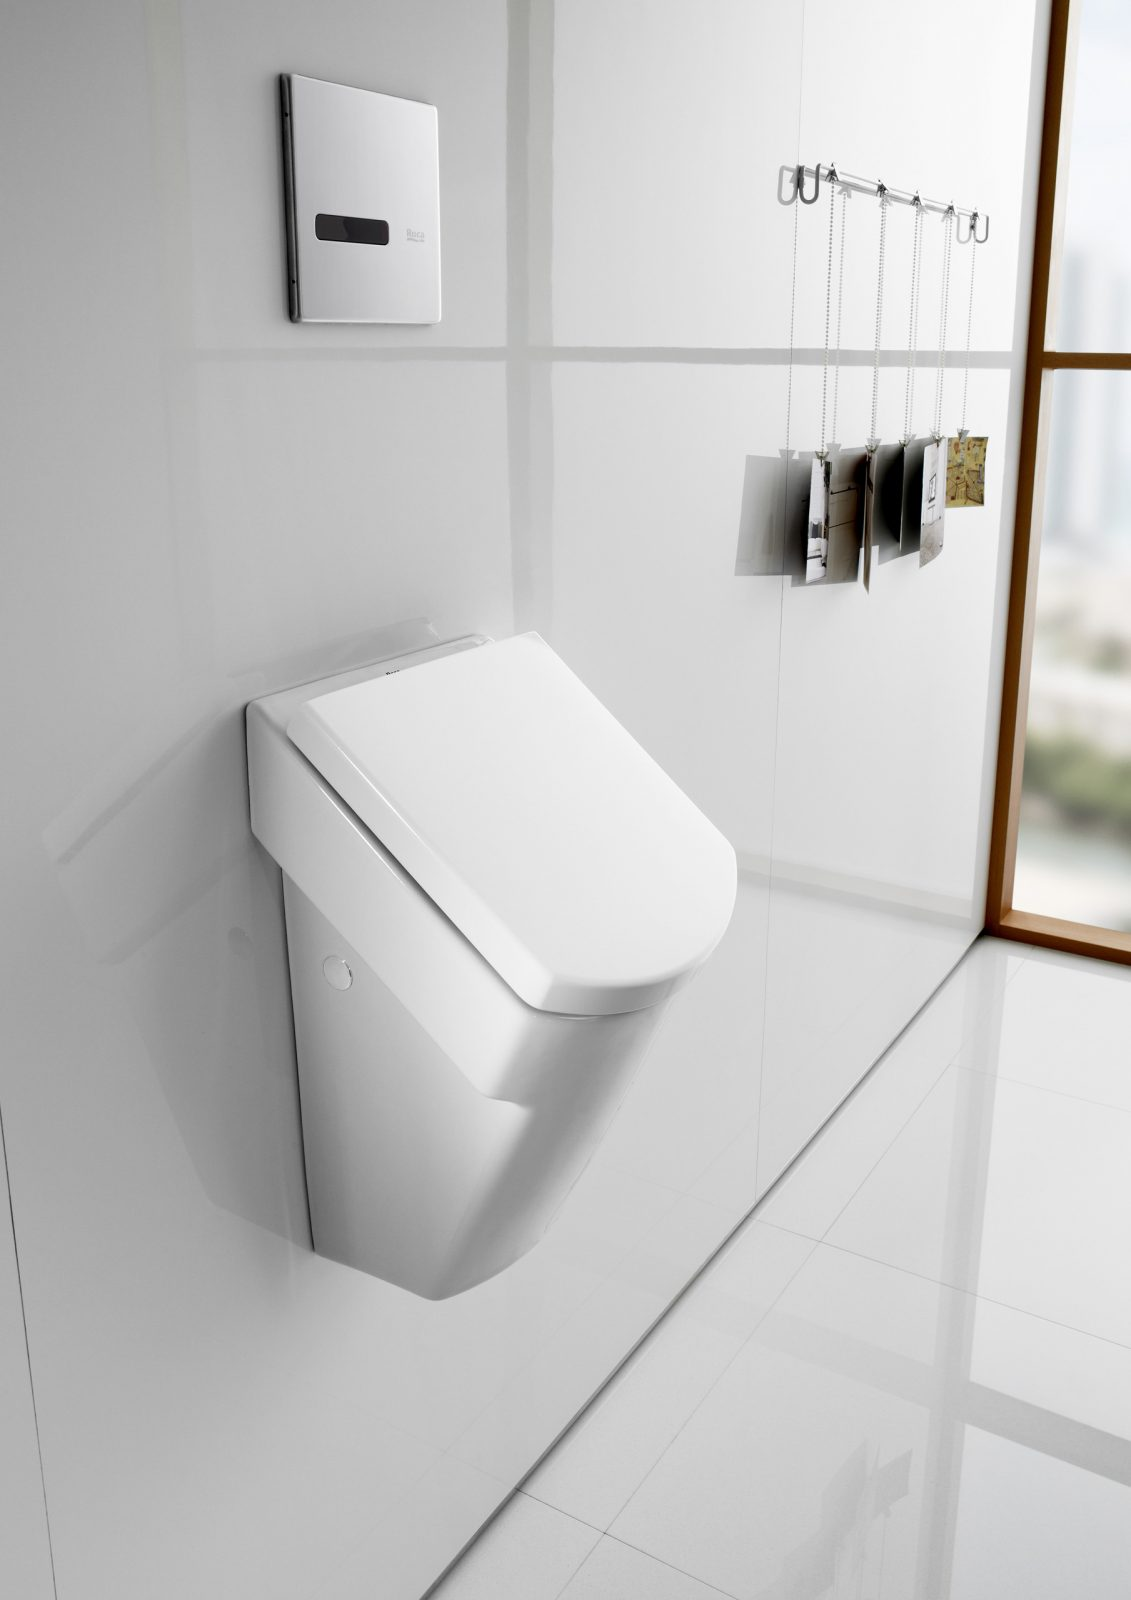 Norme Dtu Salle De Bain ~ urinoir domestique pour salle de bains hall de roca salledebains fr